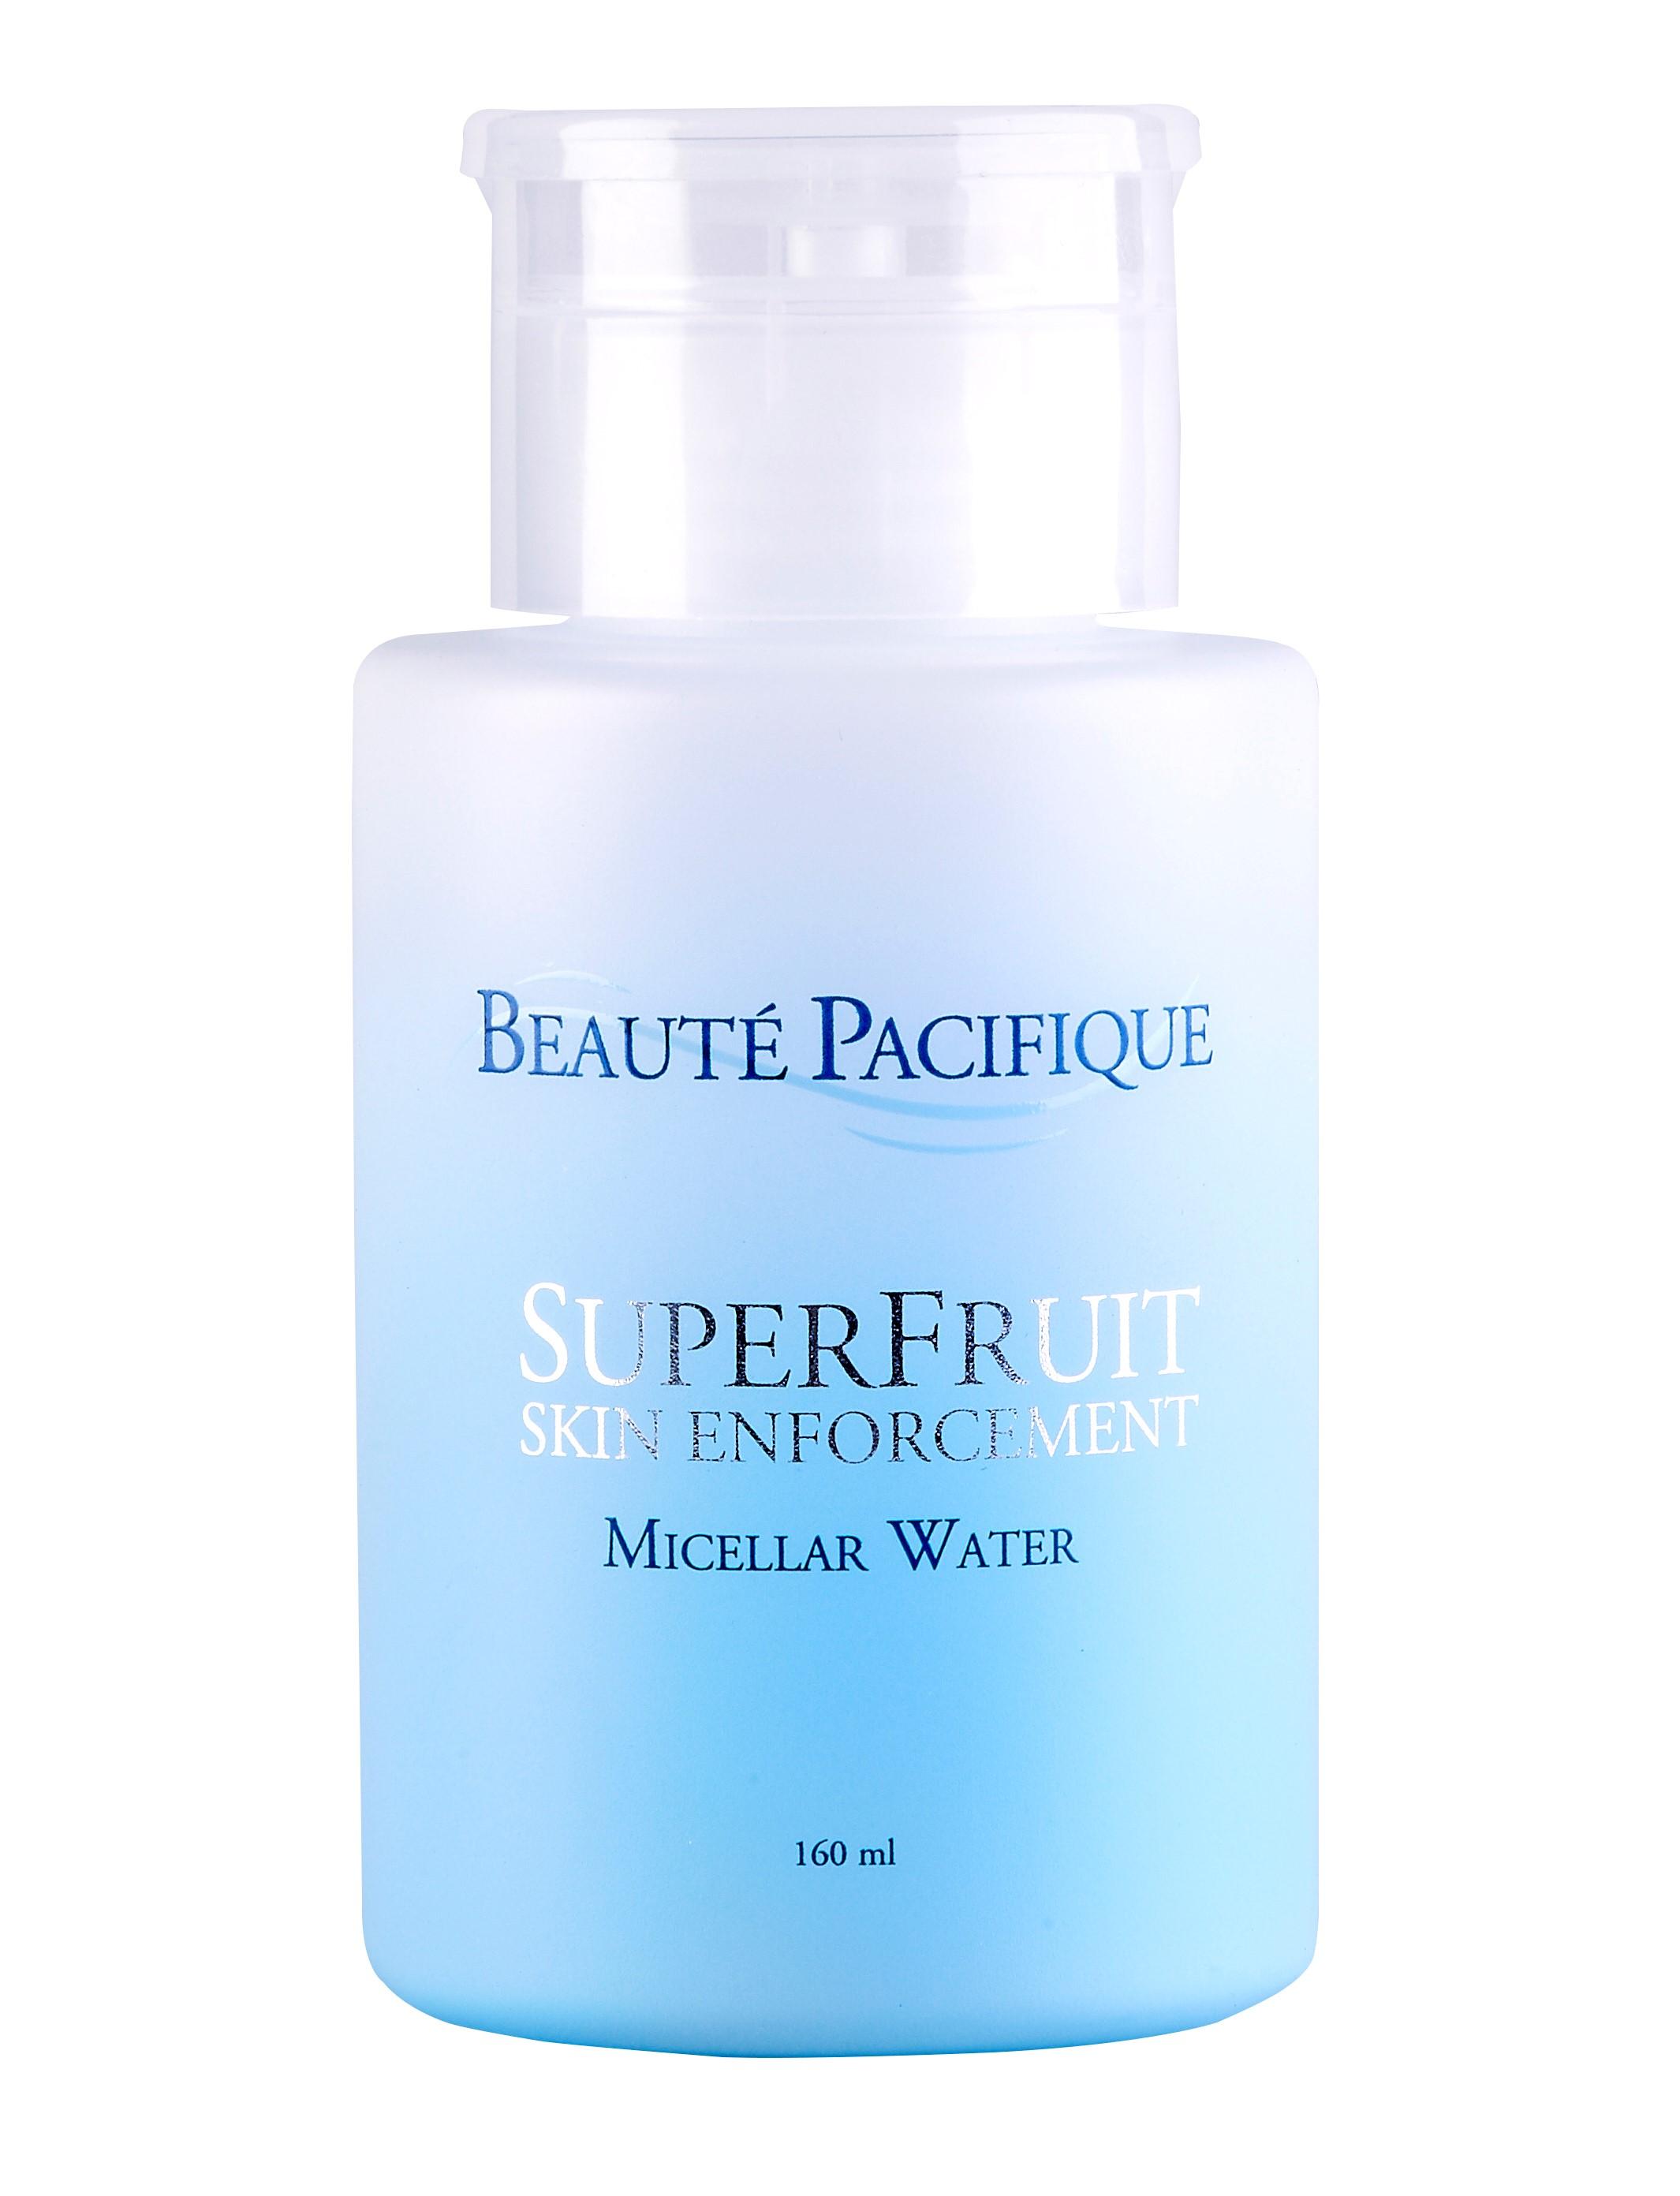 Beauté Pacifique SuperFruit Micellar Water, 160 ml